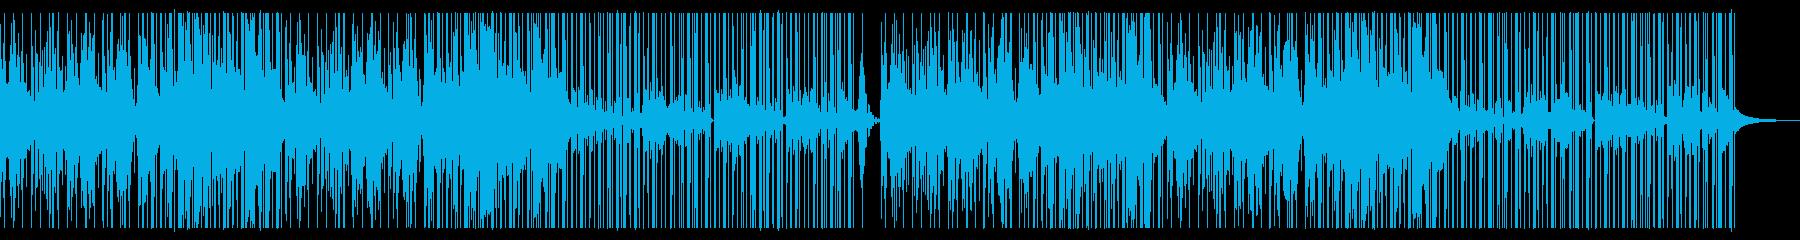 Jazzhop / Lofichillの再生済みの波形